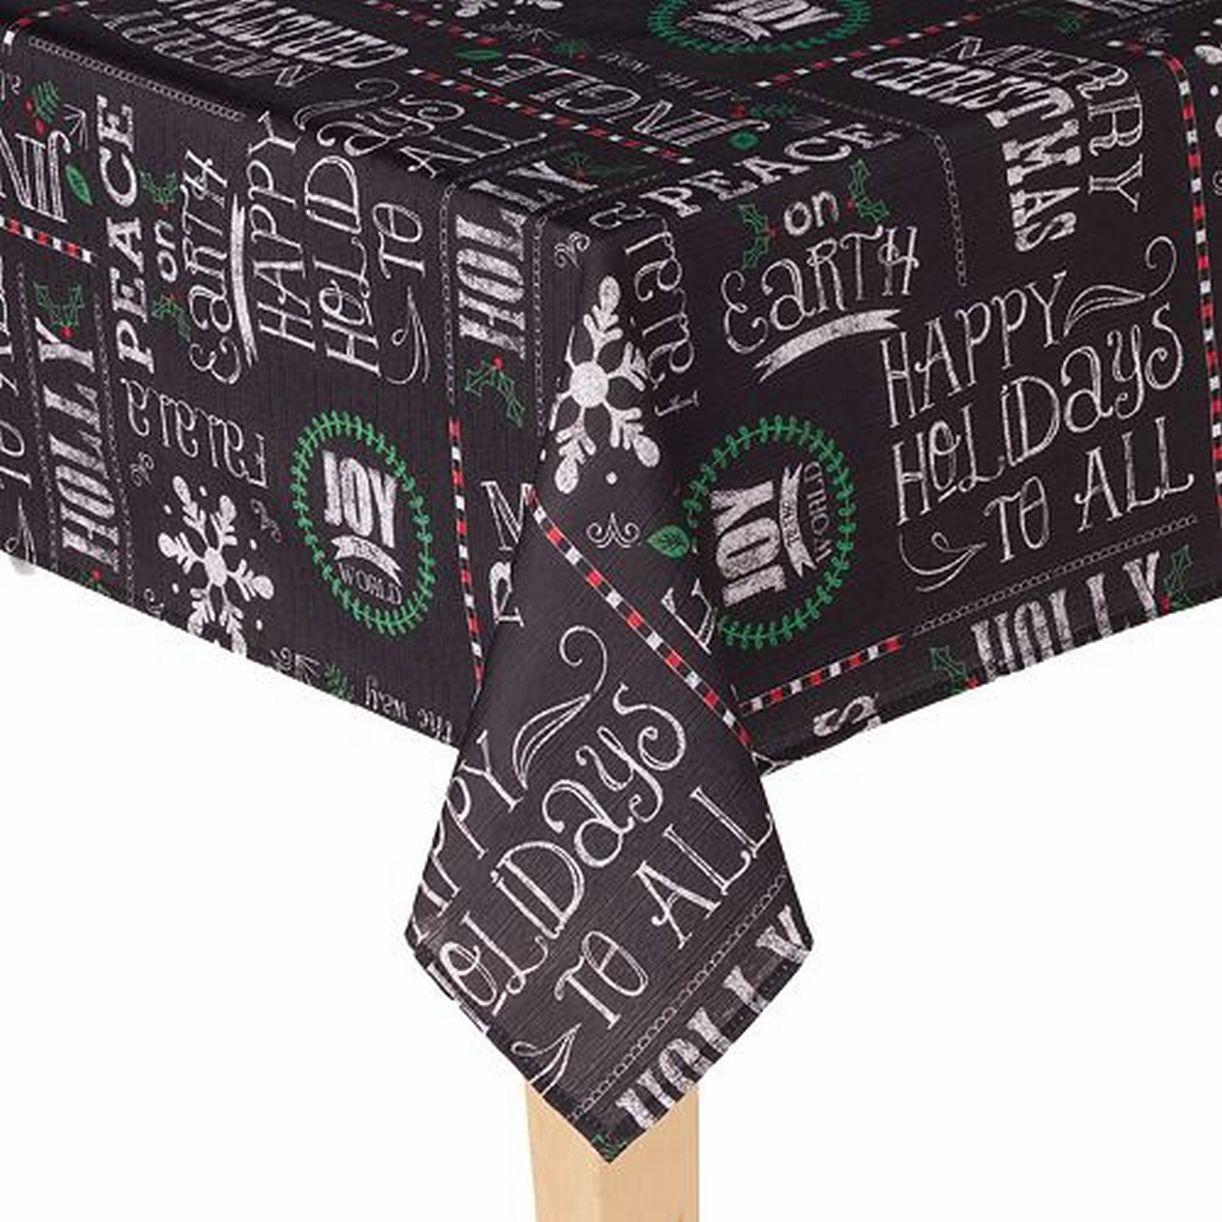 St Nicholas Square Black Christmas Sentiment Tablecloth Fabric Table Cloth 60x84 Walmart Com Walmart Com